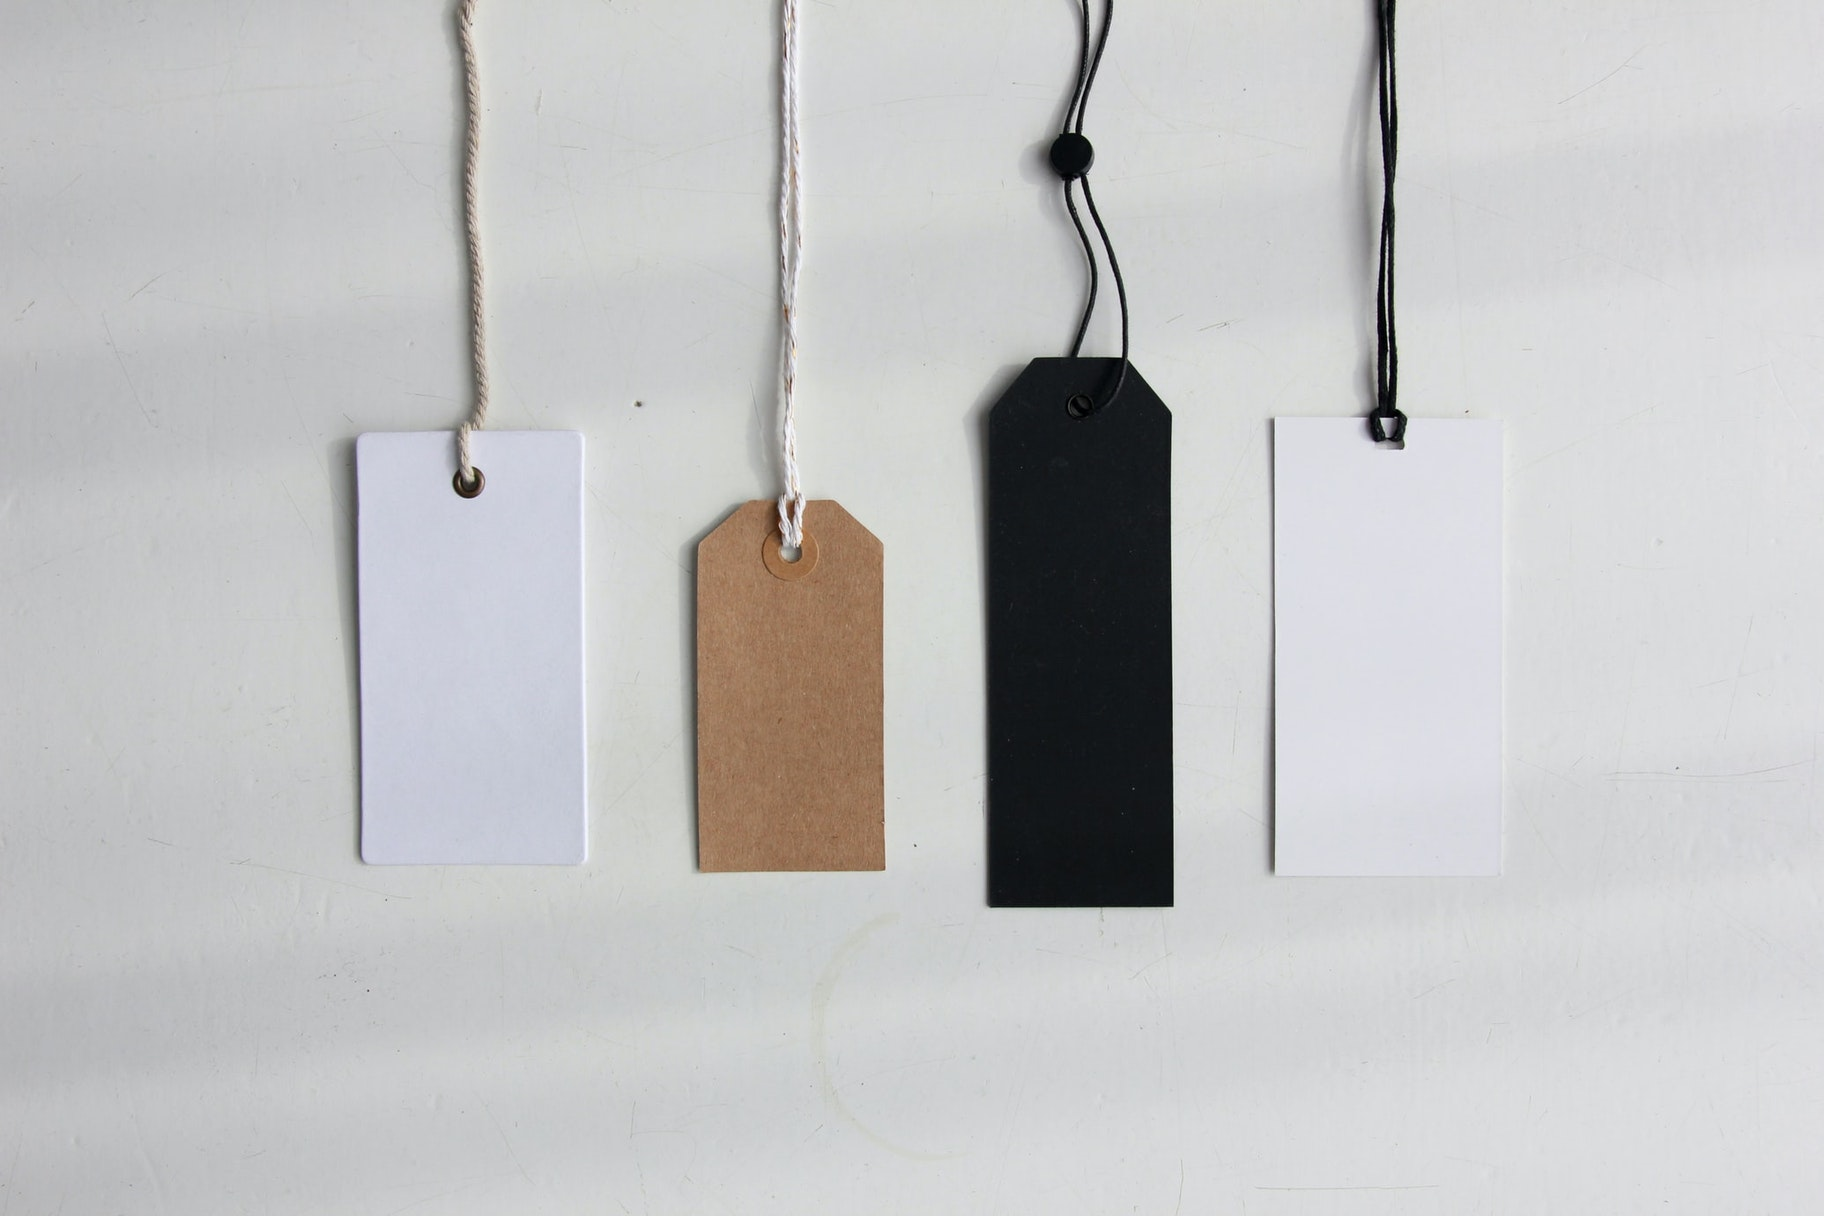 print on demand product idea: luggage tag